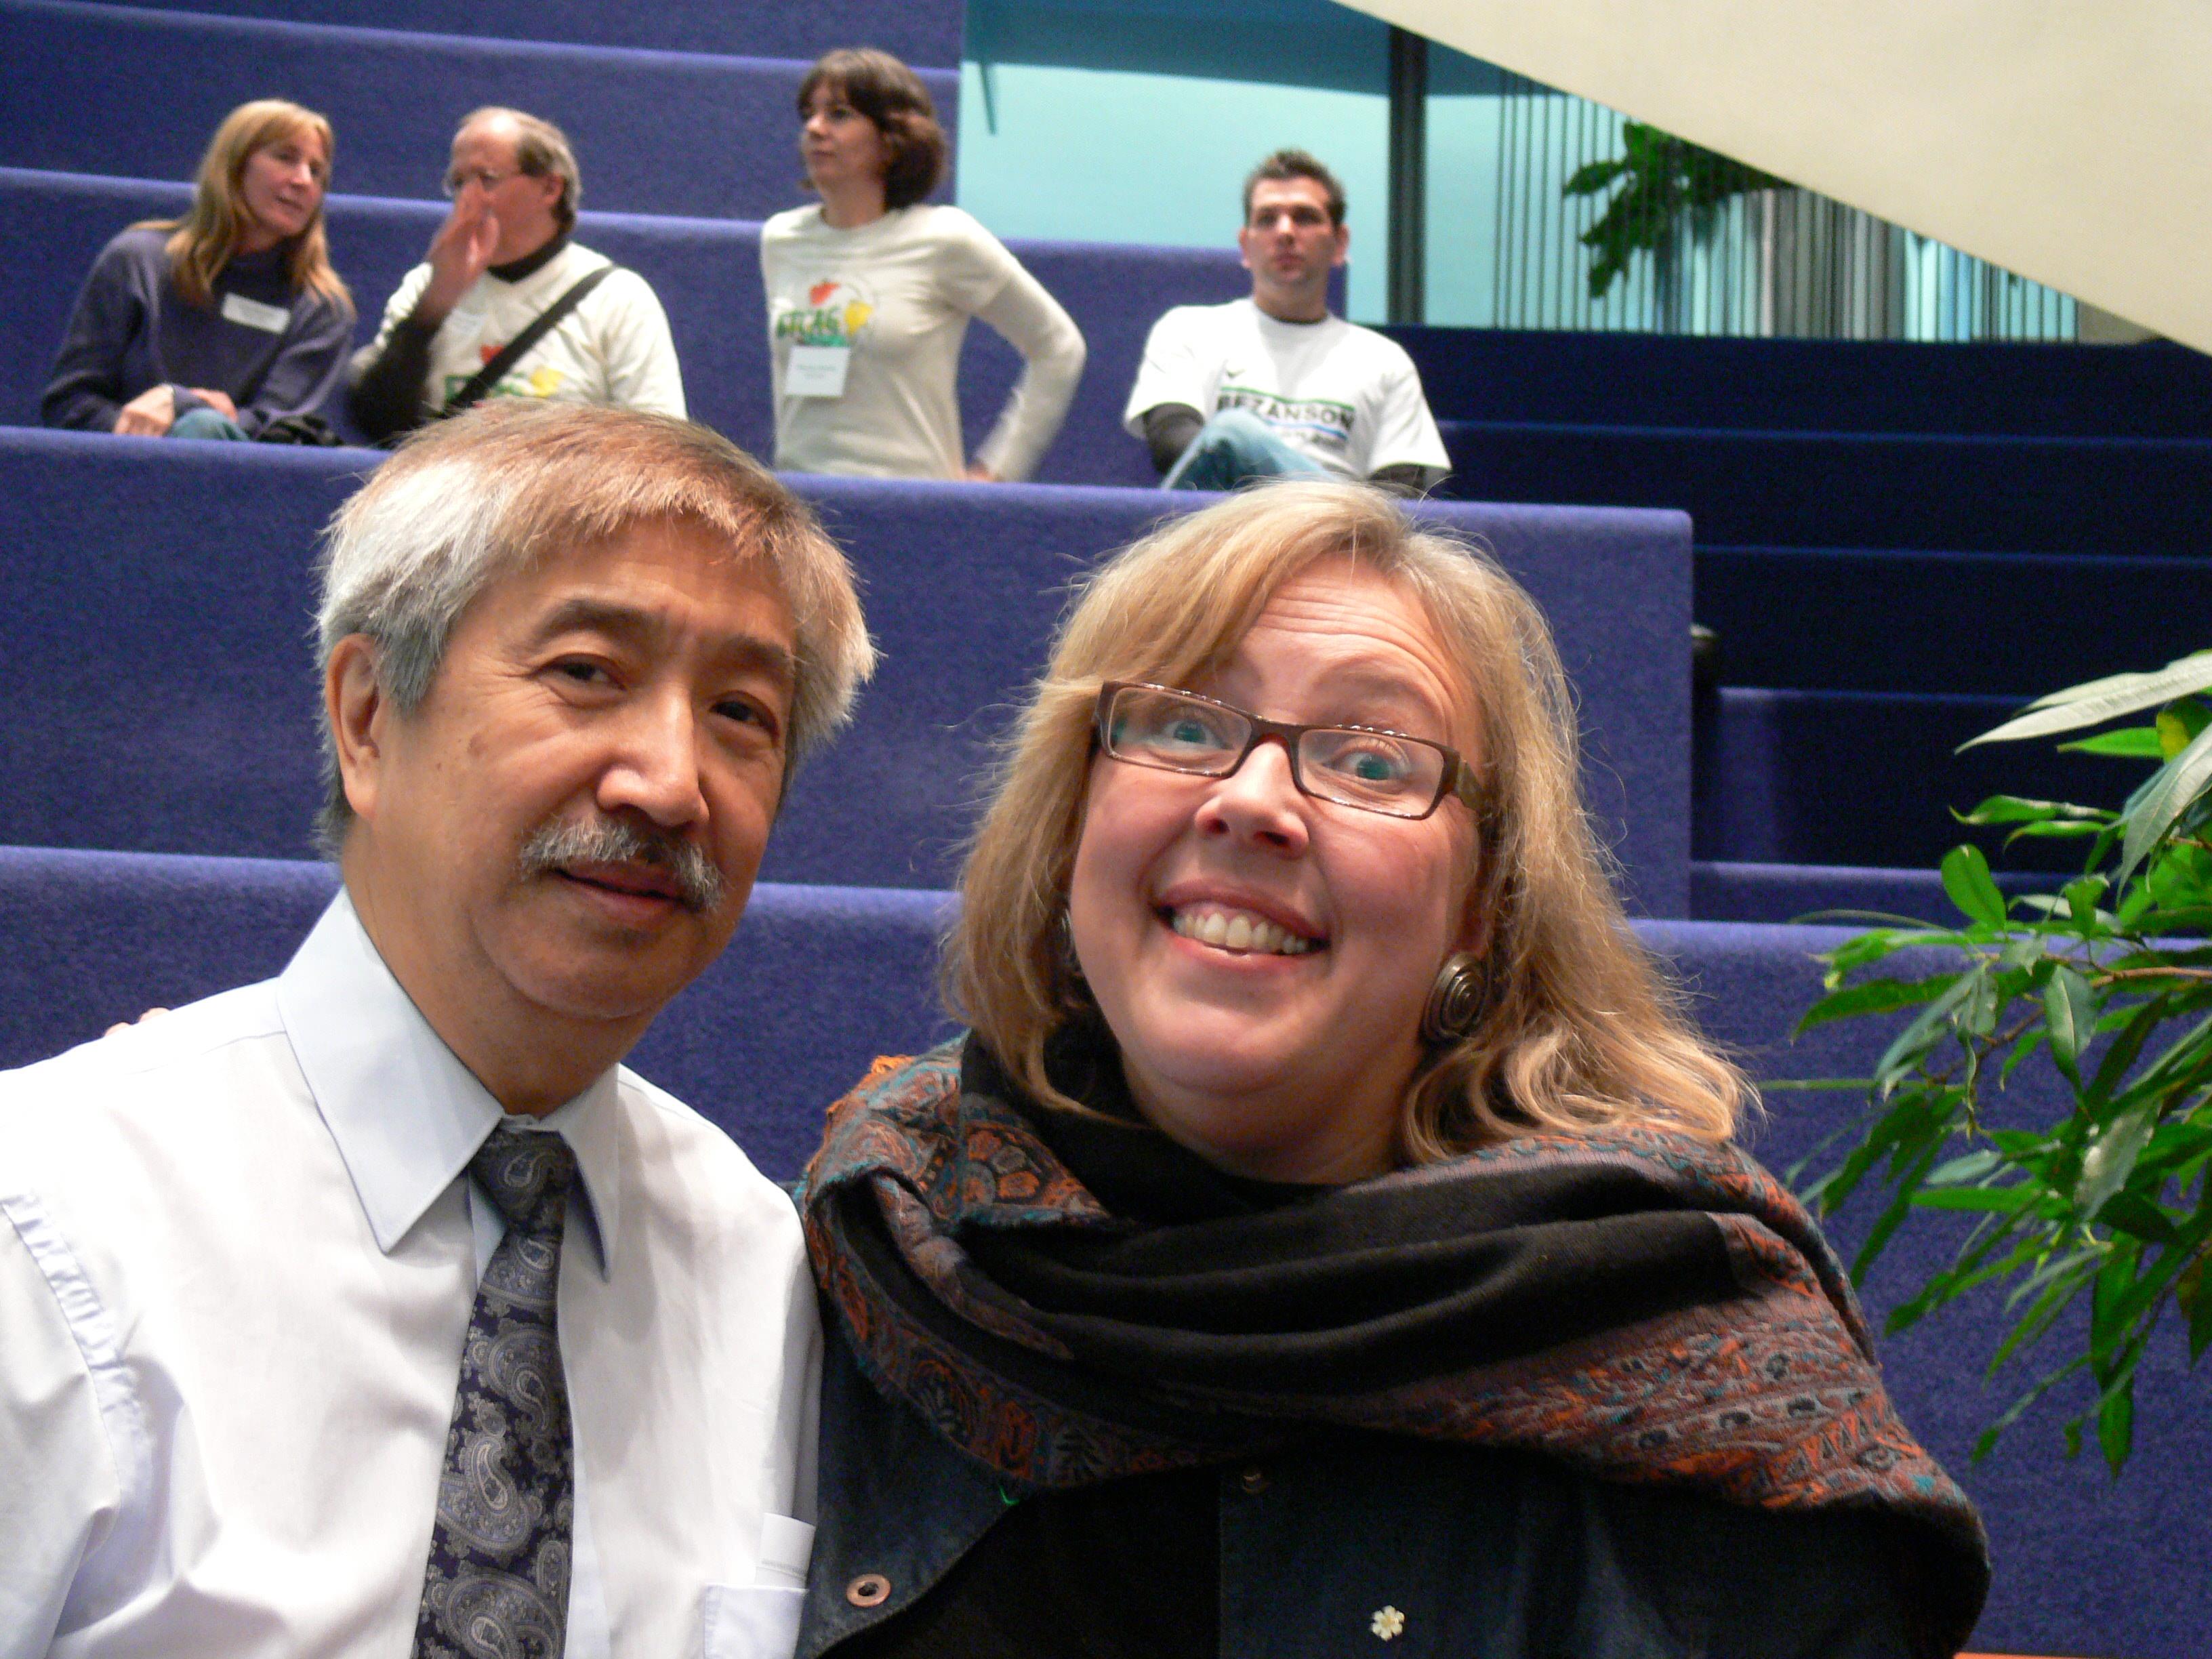 Elizabeth May and Ed Chin